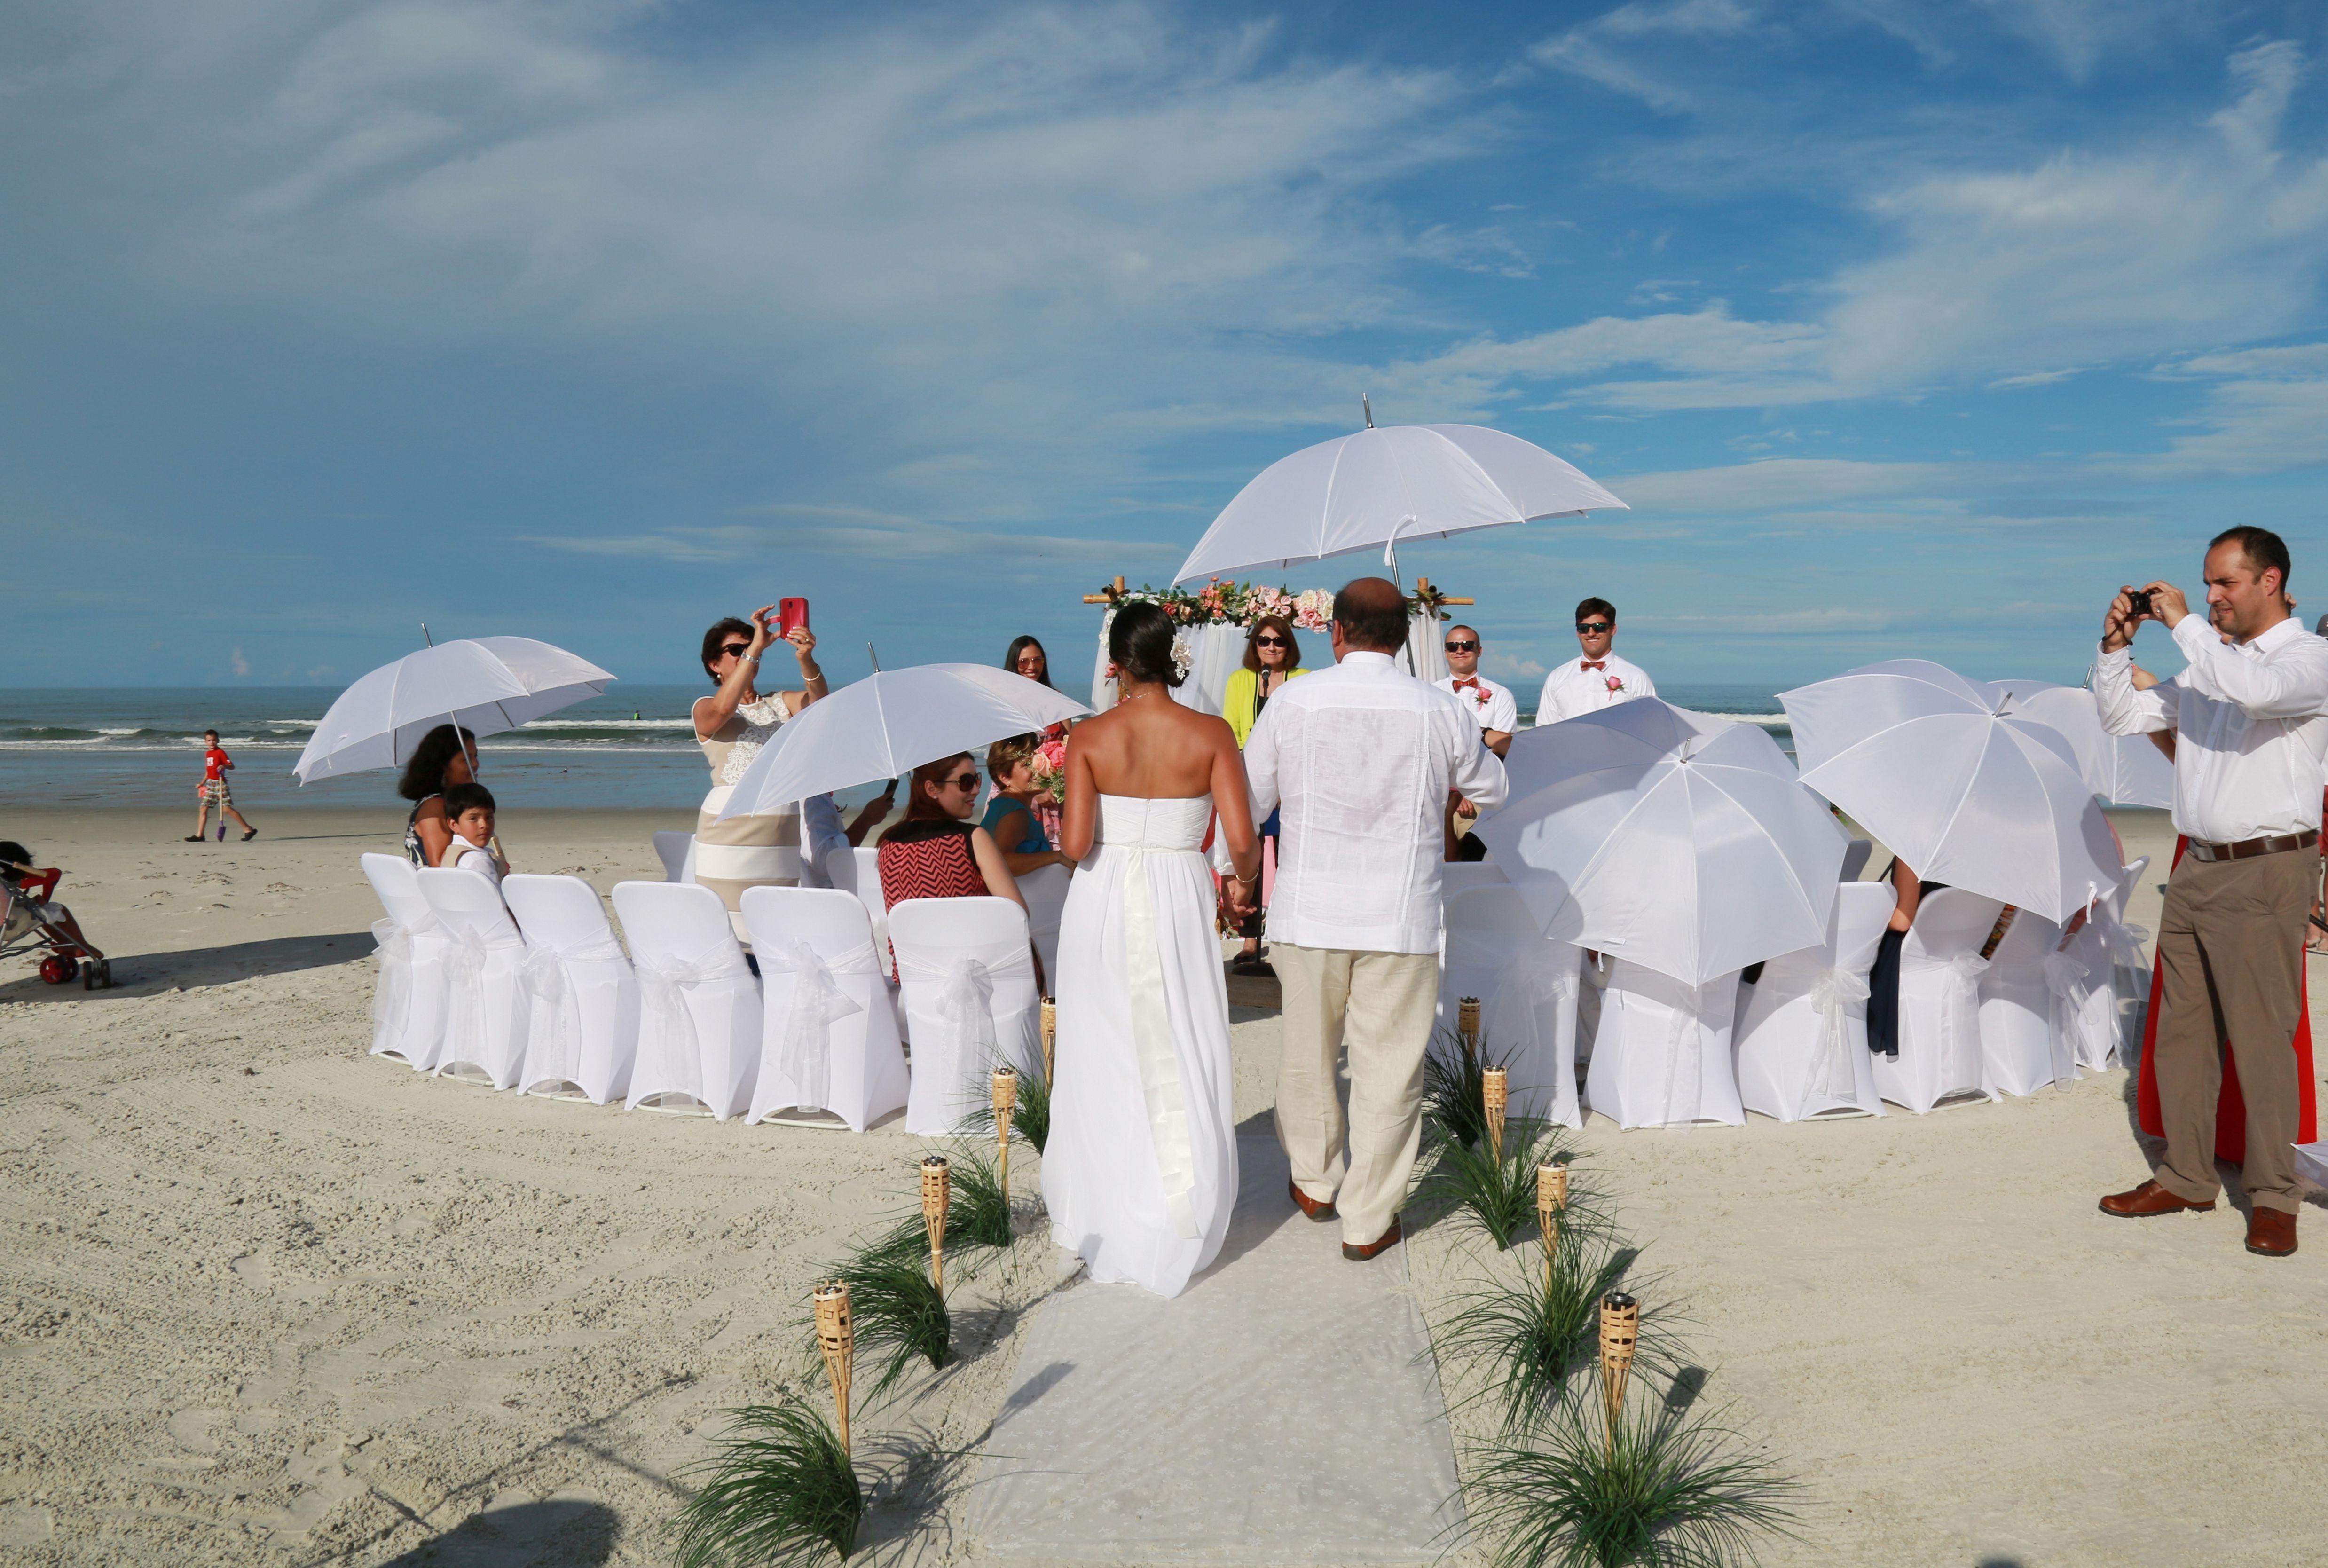 White Umbrellas For Shade At Beach Wedding In New Smyrna Florida Destination